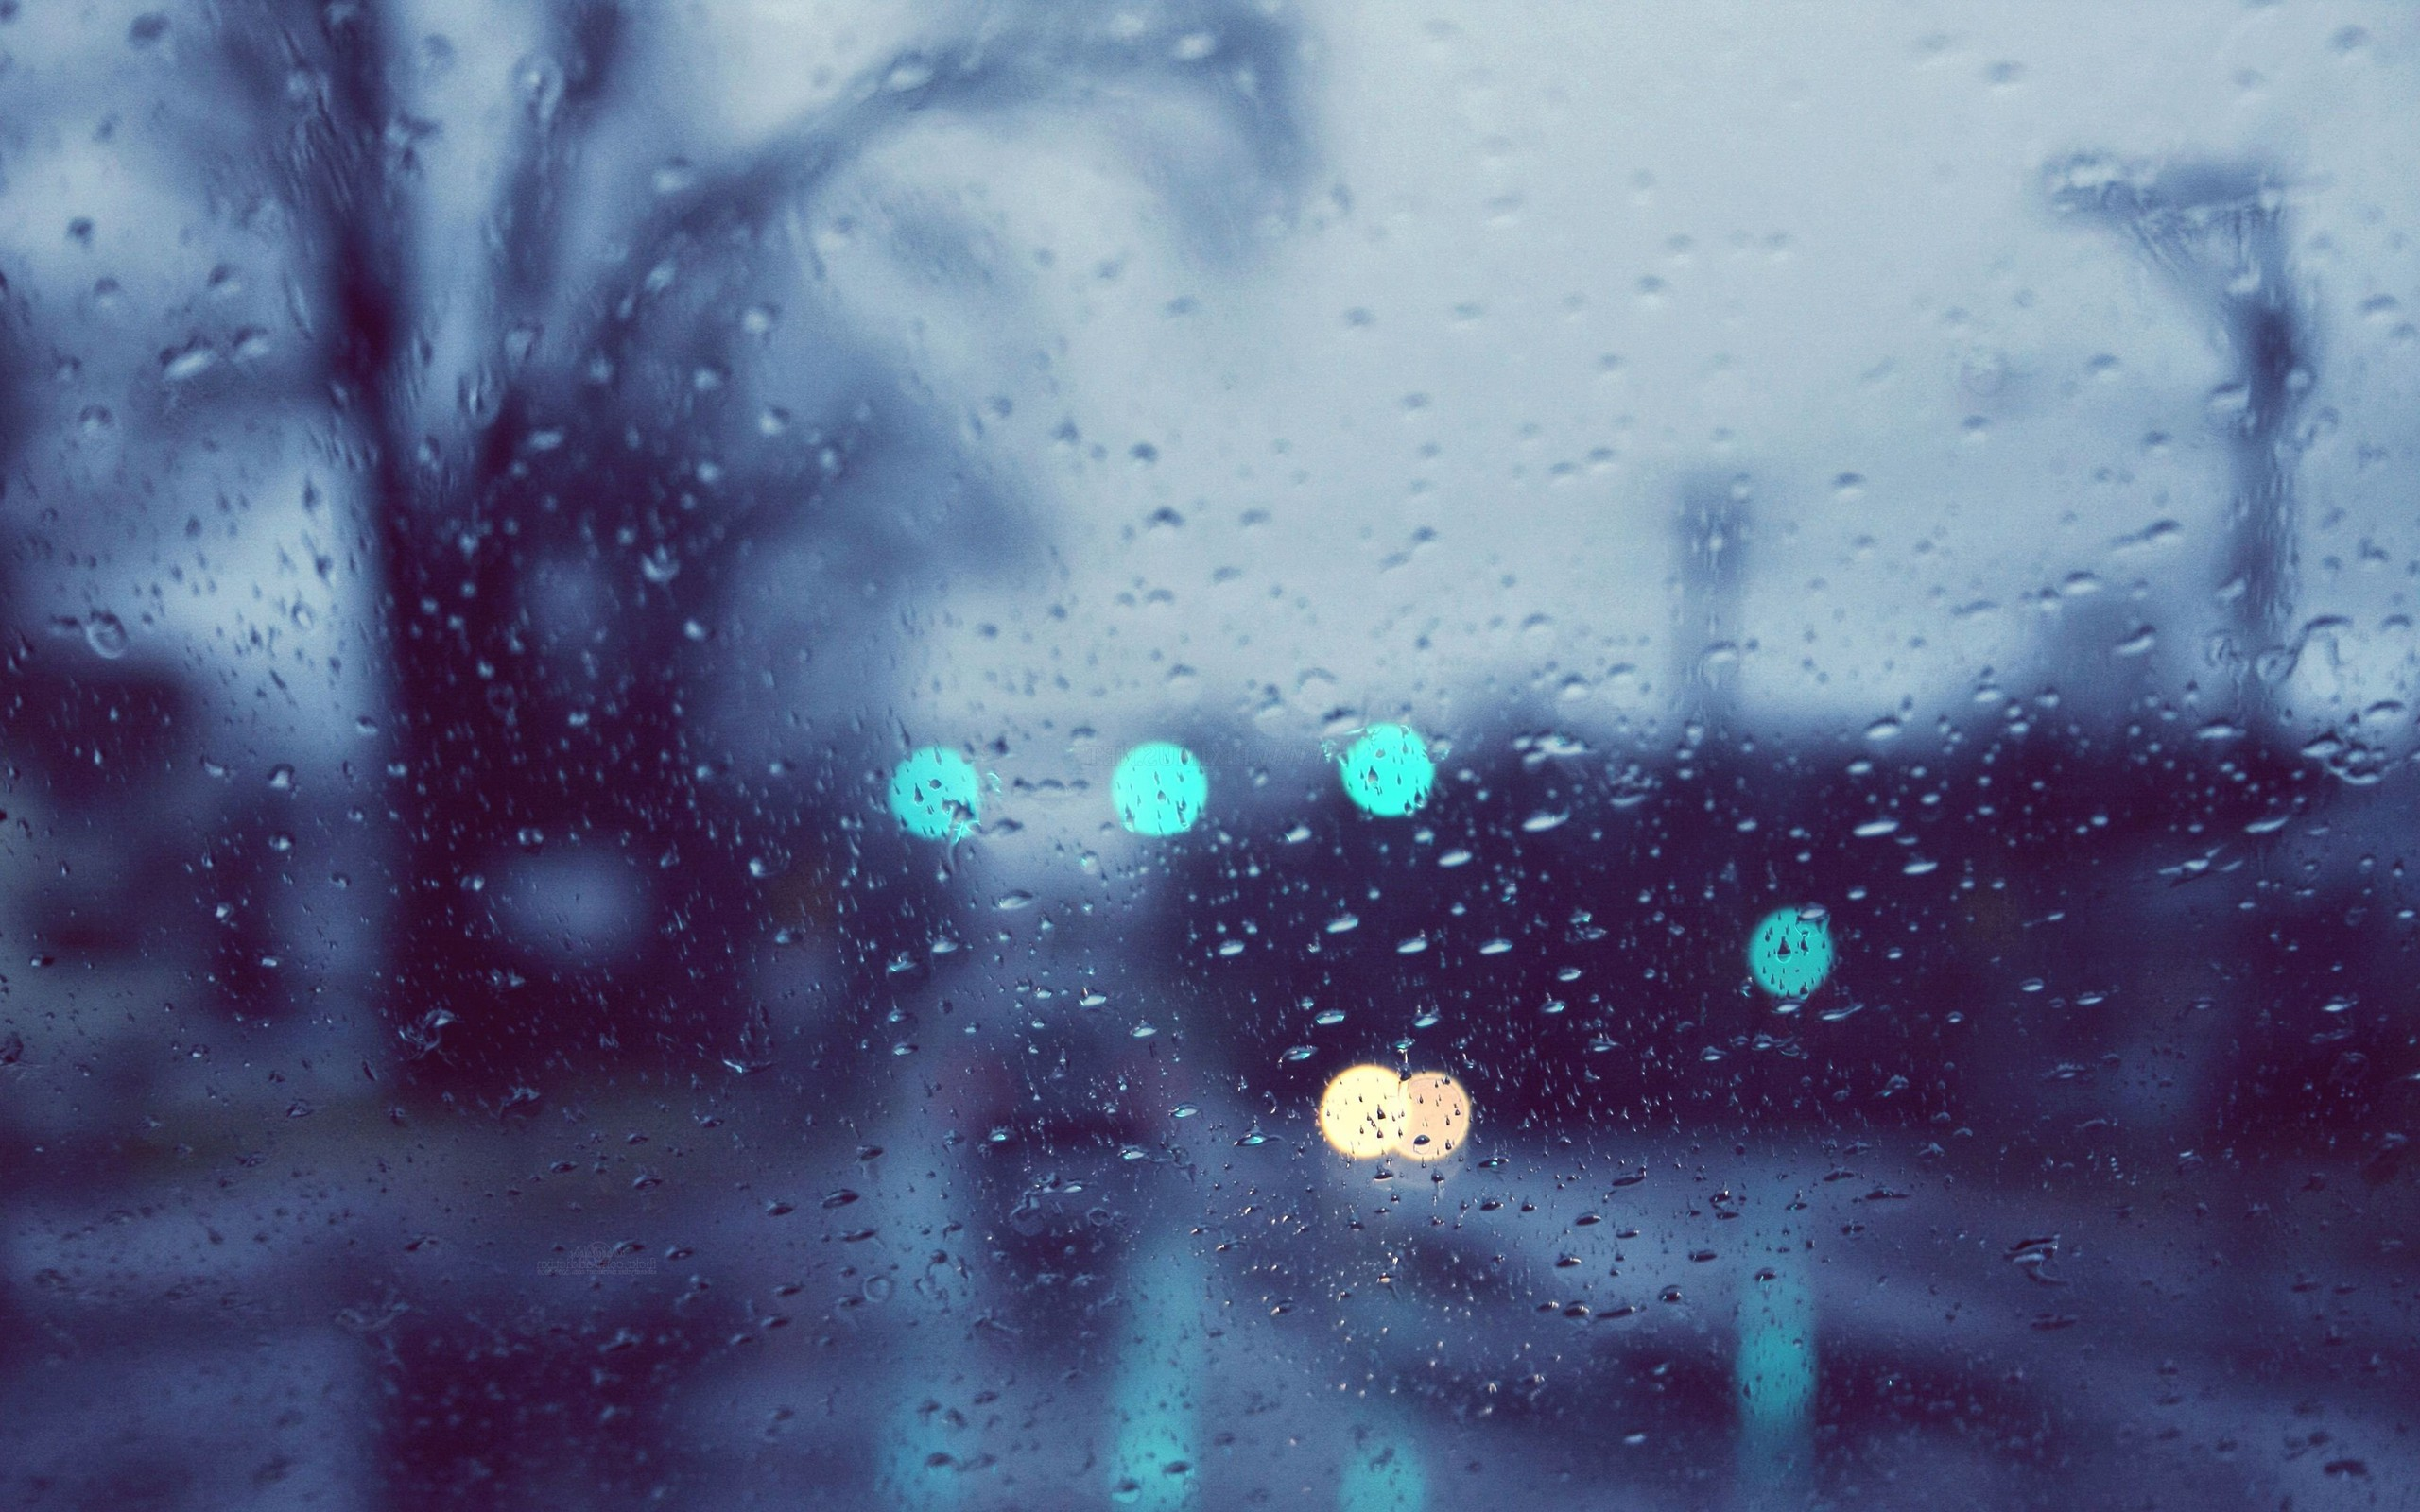 Rain wallpaper | 2560x1600 | #39325